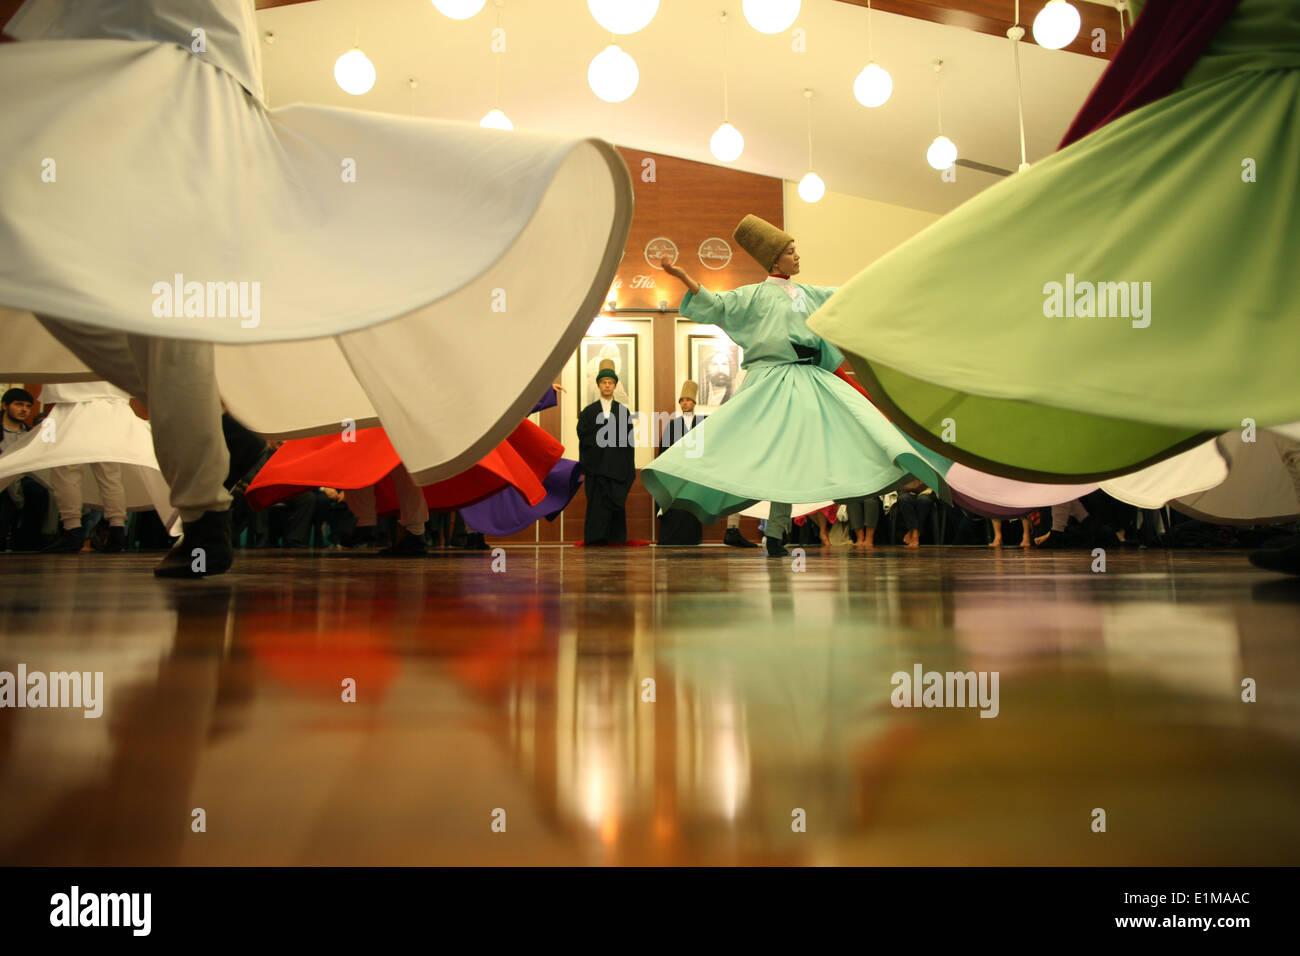 Whirling dervish performance in Silvrikapi Meylana cultural center - Stock Image